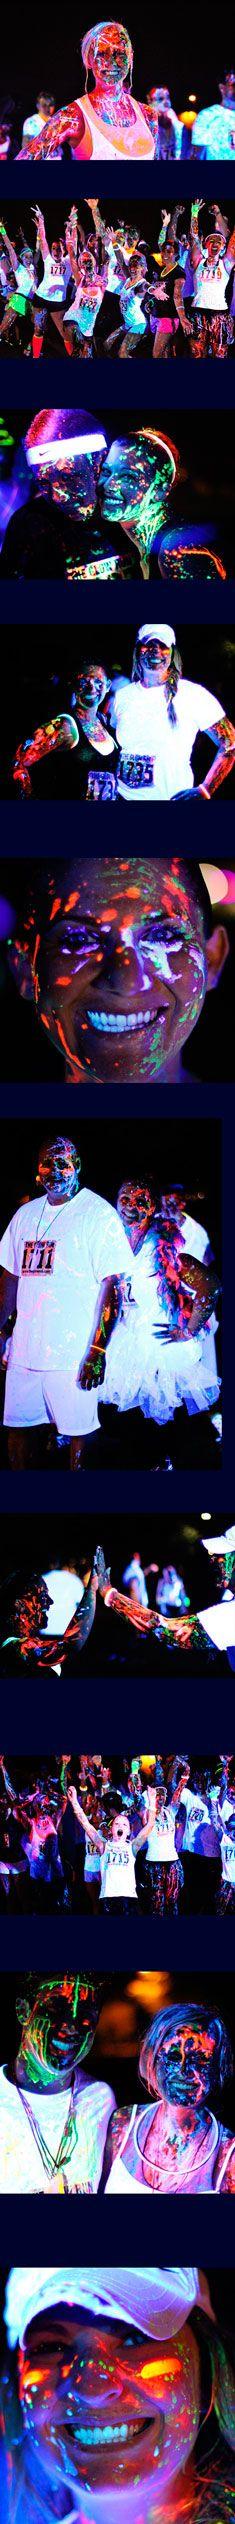 oooohh yeah! i found another run to do!!!  Neon splash dash  neon glow in the dark 5k!!!!  signing up ASAP!